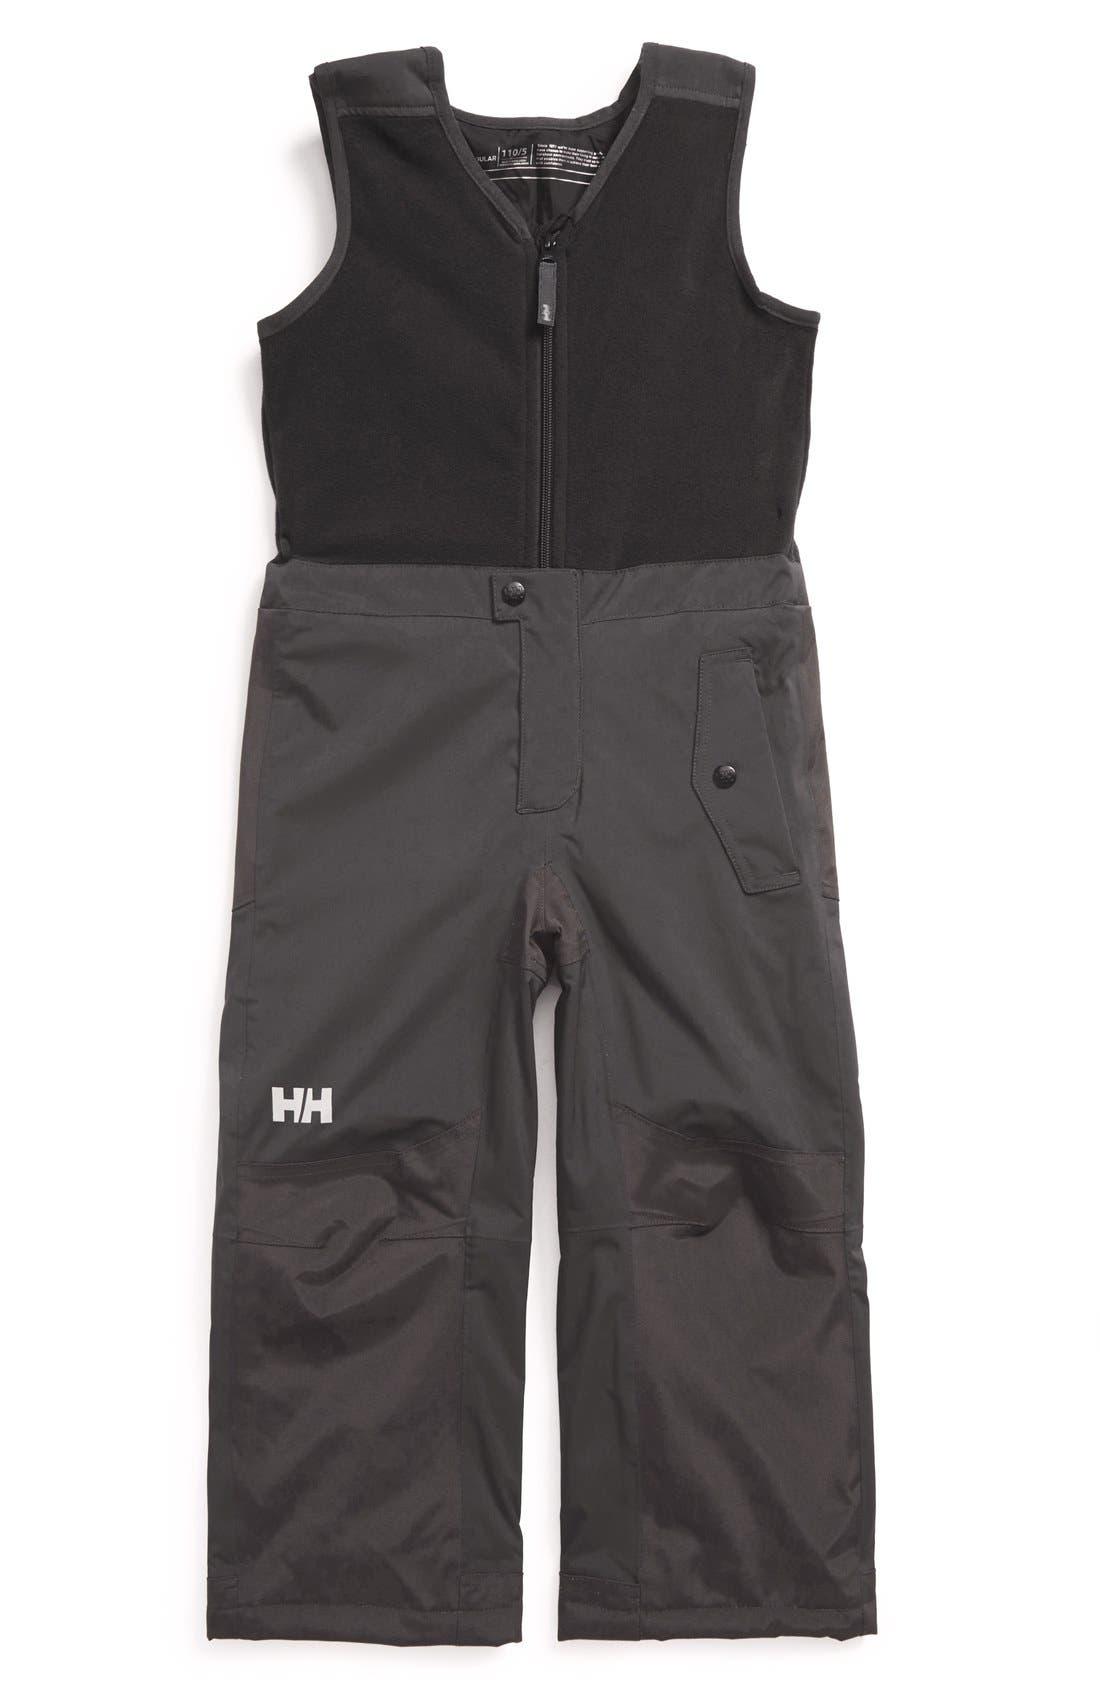 Alternate Image 1 Selected - HellyHansen 'K Powder' Insulated Bib(Toddler Boys & Little Boys)